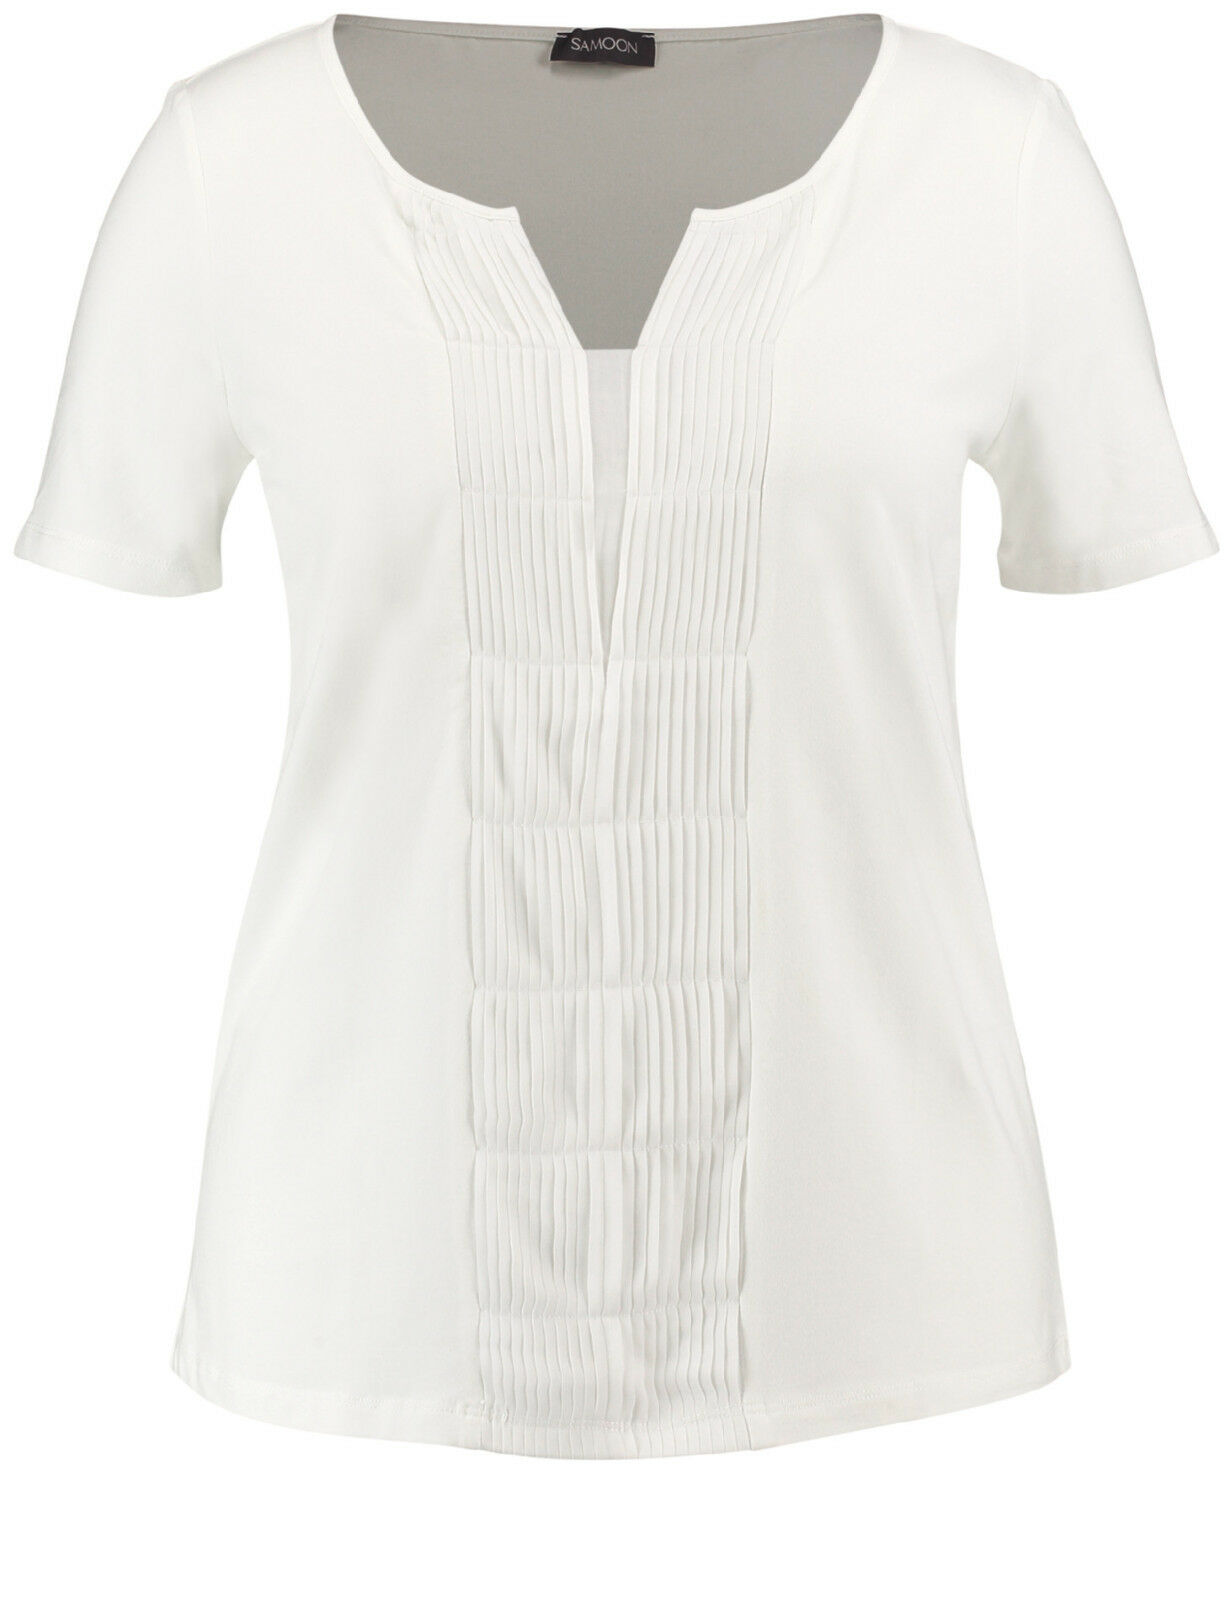 Samoon Shirt mit Biesen by Gerry Weber Stretchshirt Neu gedecktes Weiß Damen Gr.